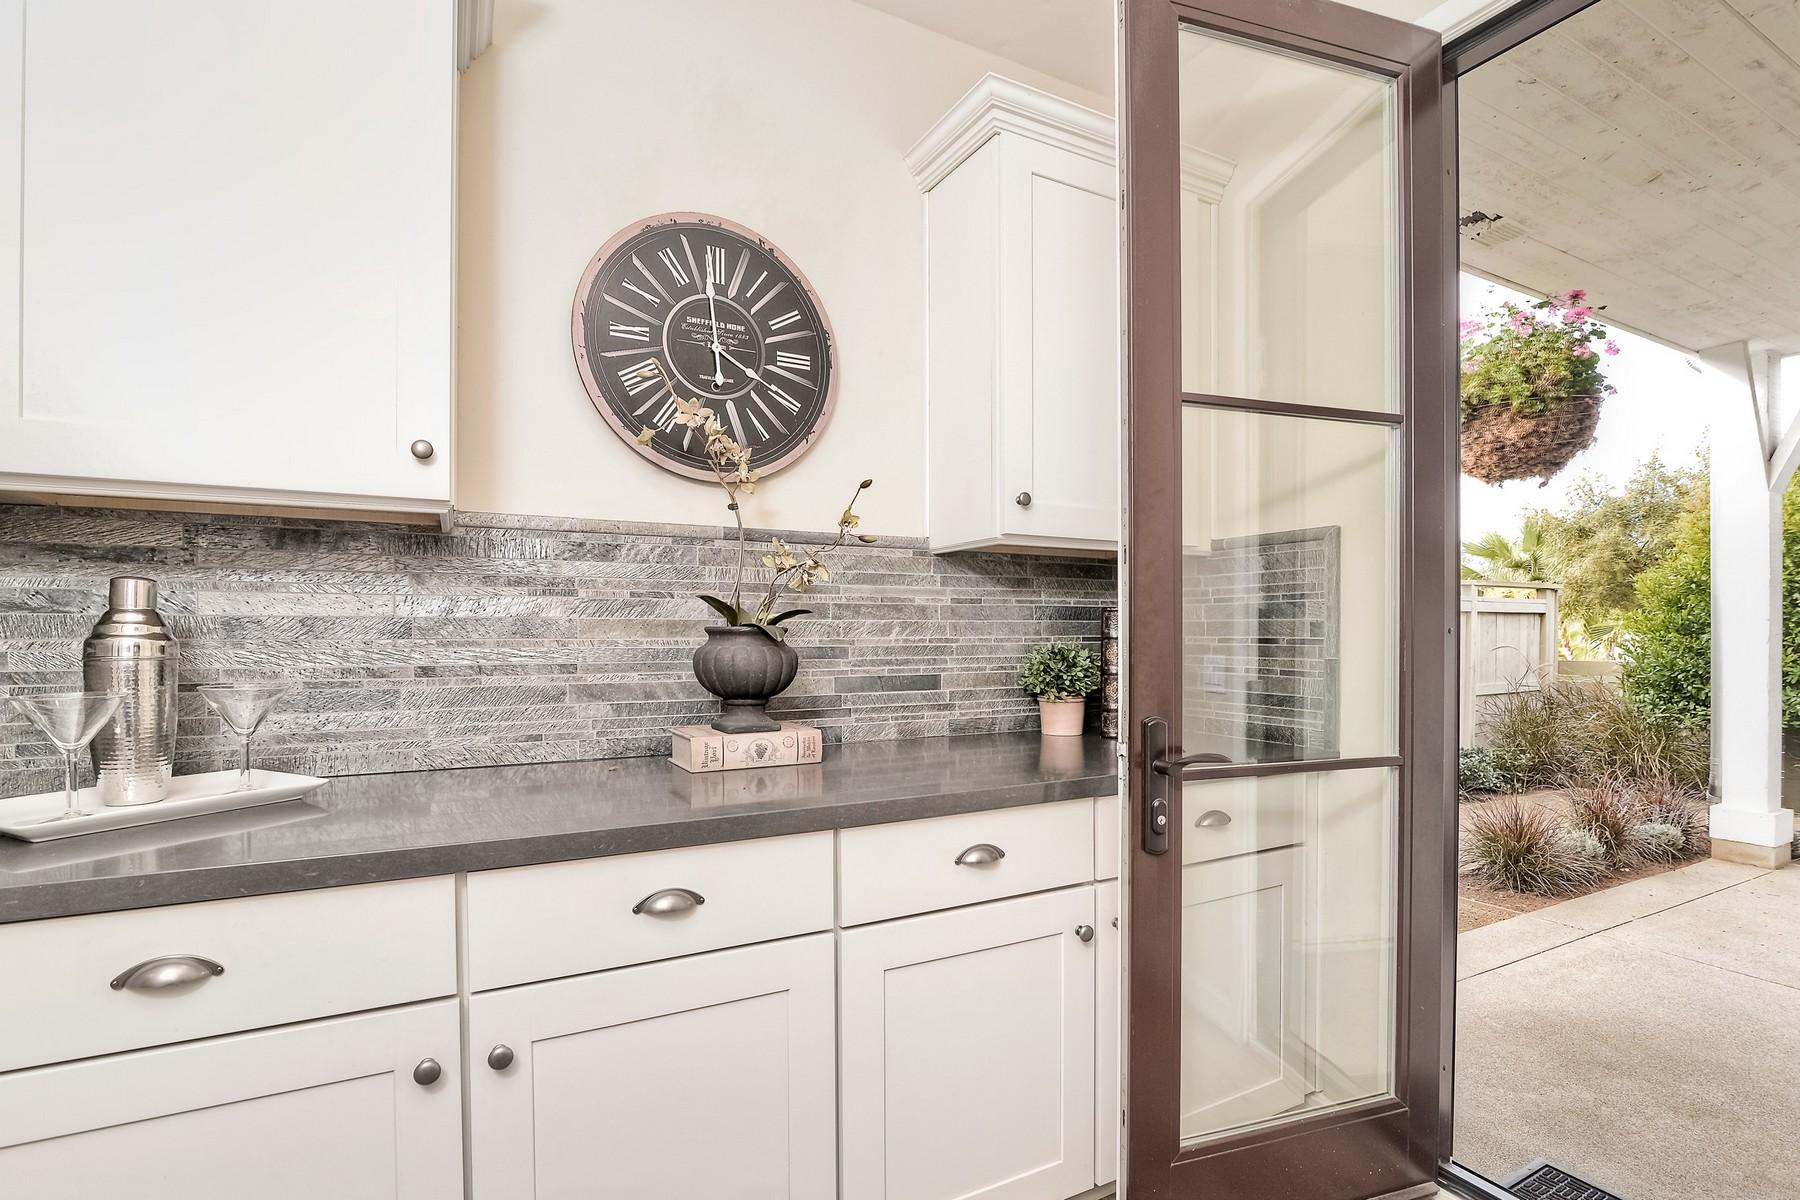 Additional photo for property listing at 1497 Halia Court  Encinitas, California 92024 United States